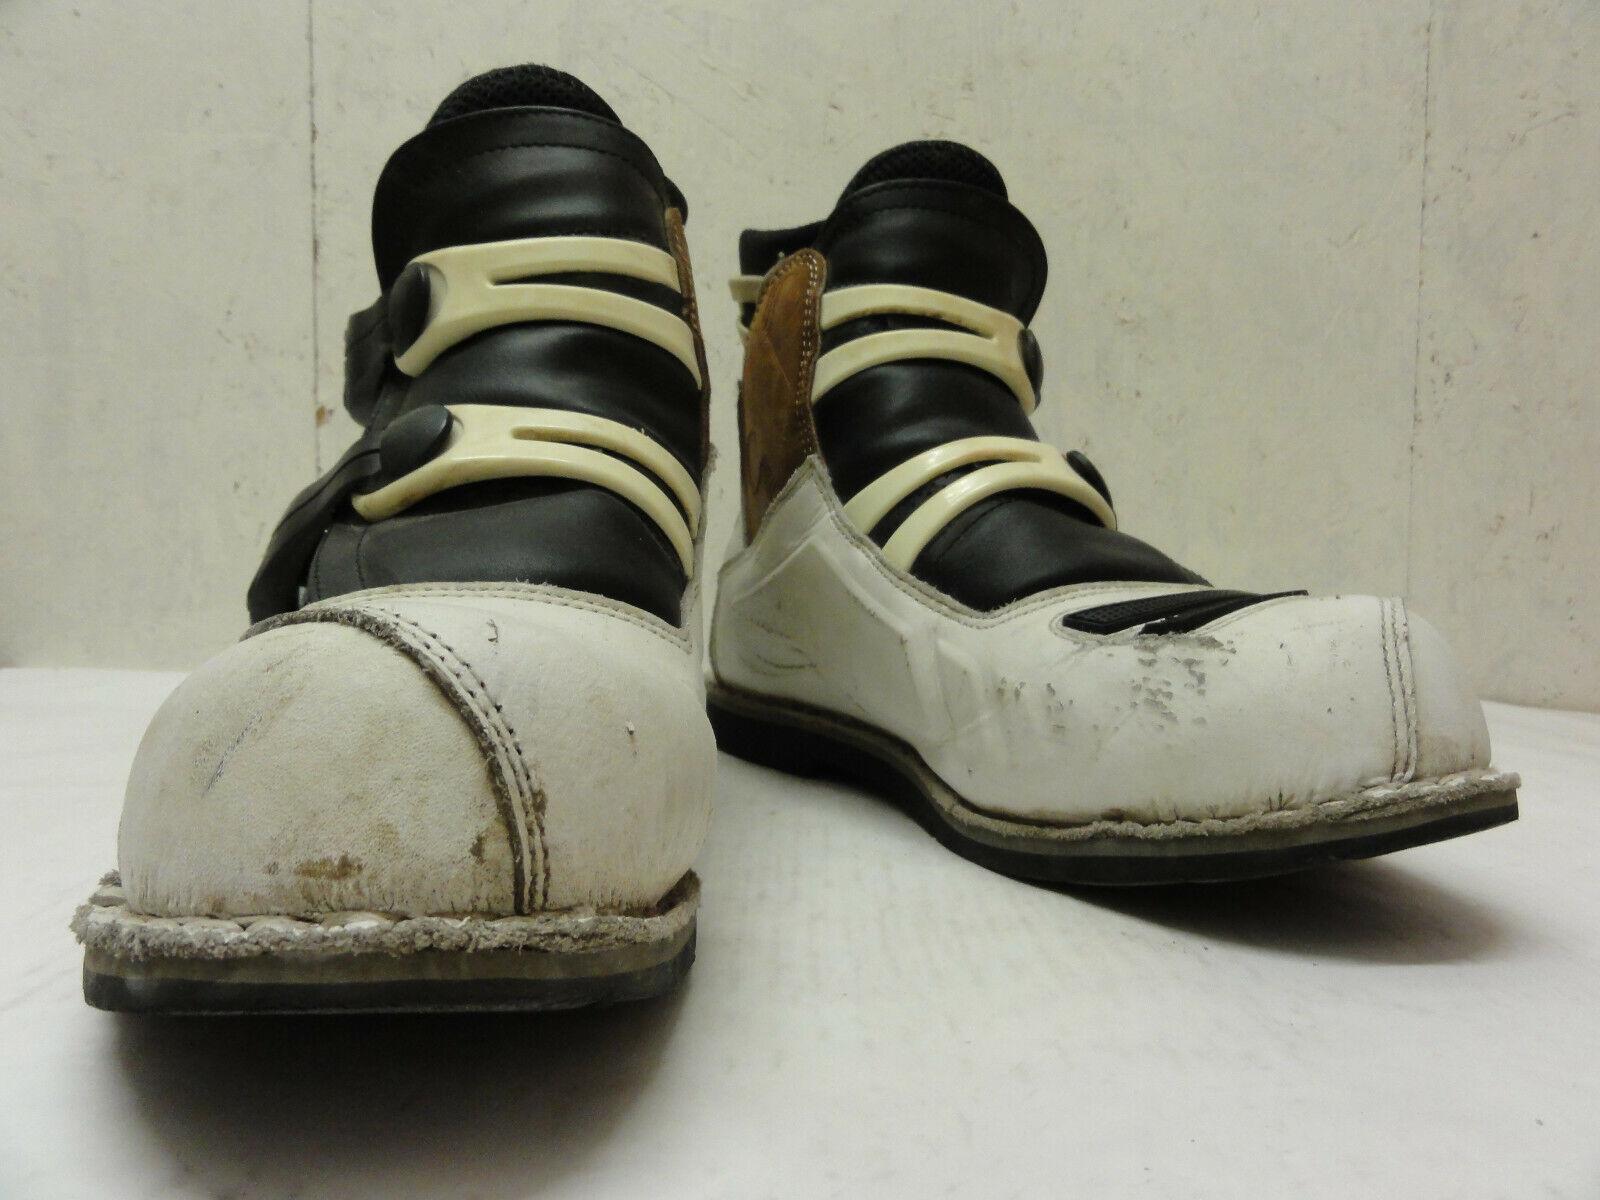 Motocross botten laarzen boots ICON nike gay biker alpinestars 12